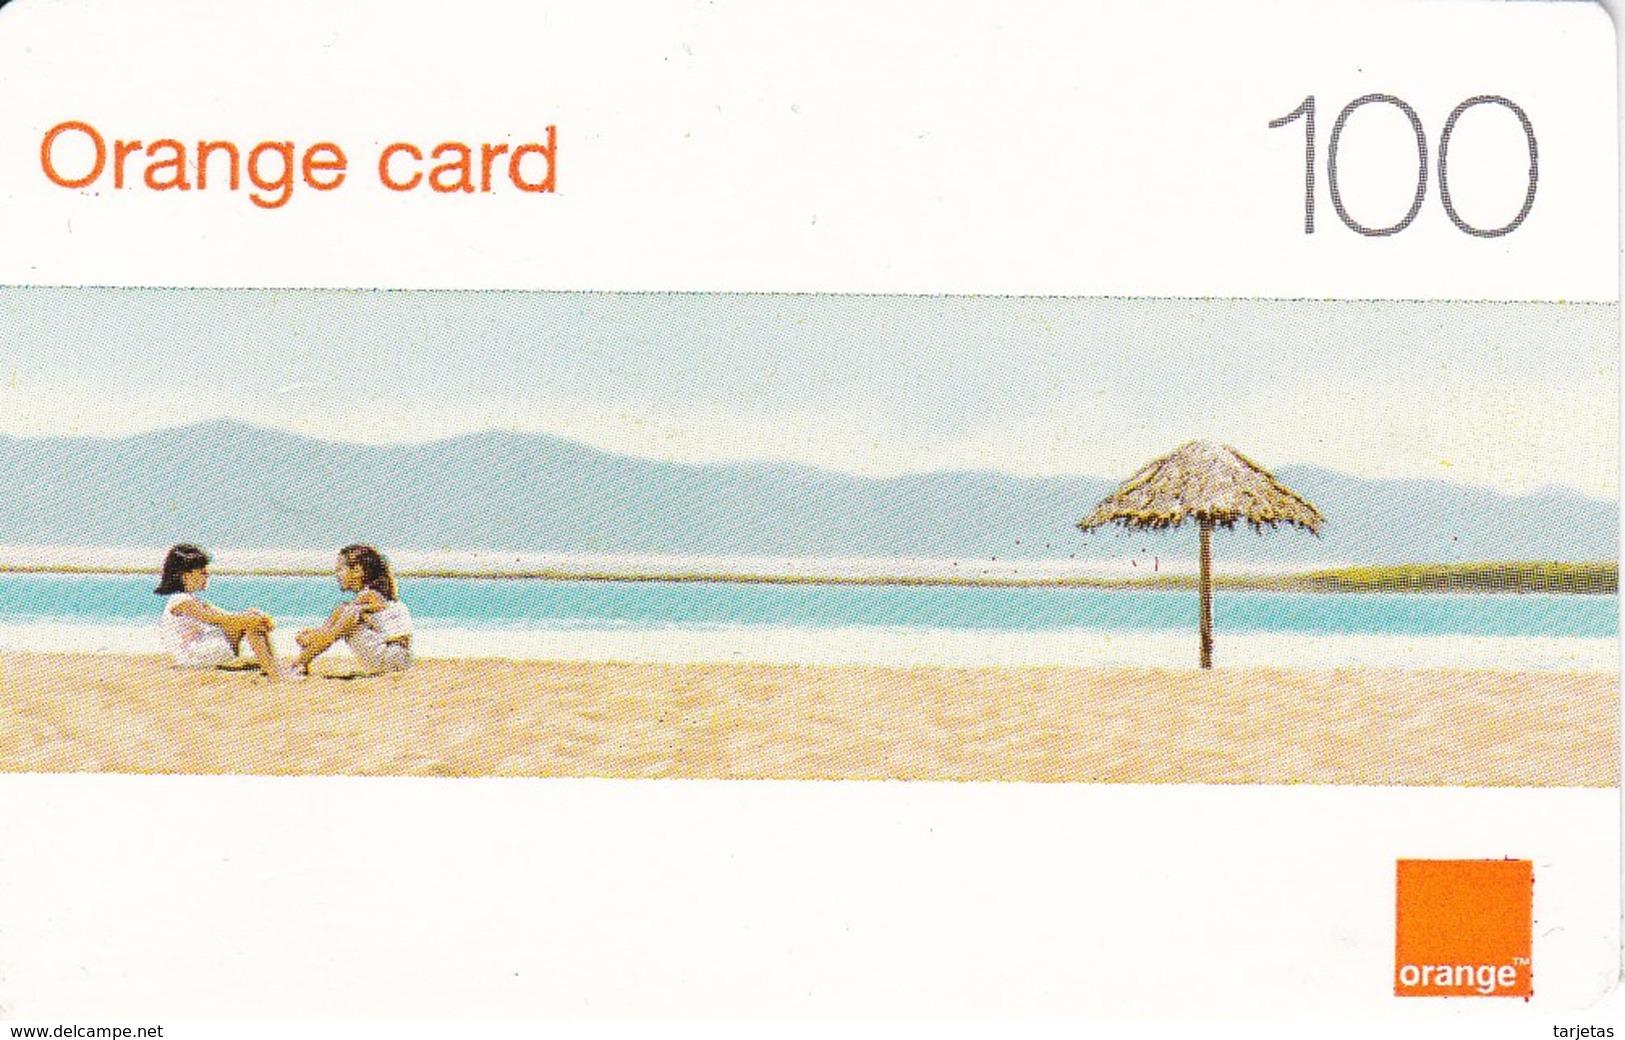 TARJETA DE LA REPUBLICA DOMINICANA  DE 100 UNITS DE ORANGE CARD (NIÑAS EN LA PLAYA) - Dominicana